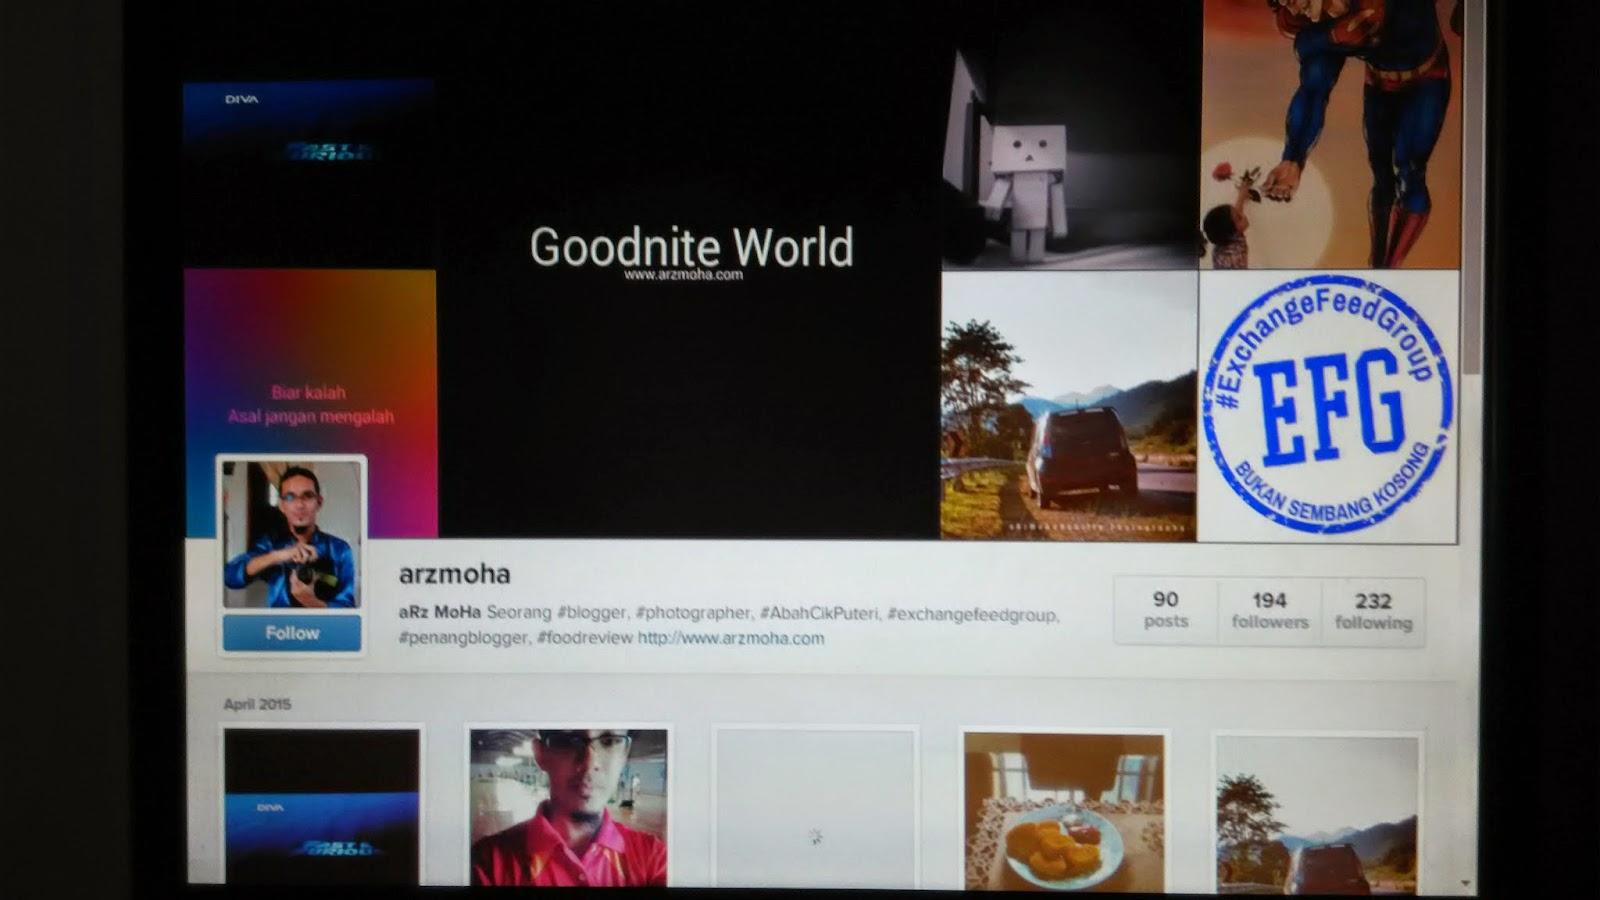 arzmoha, instagram, media social, follow instagram